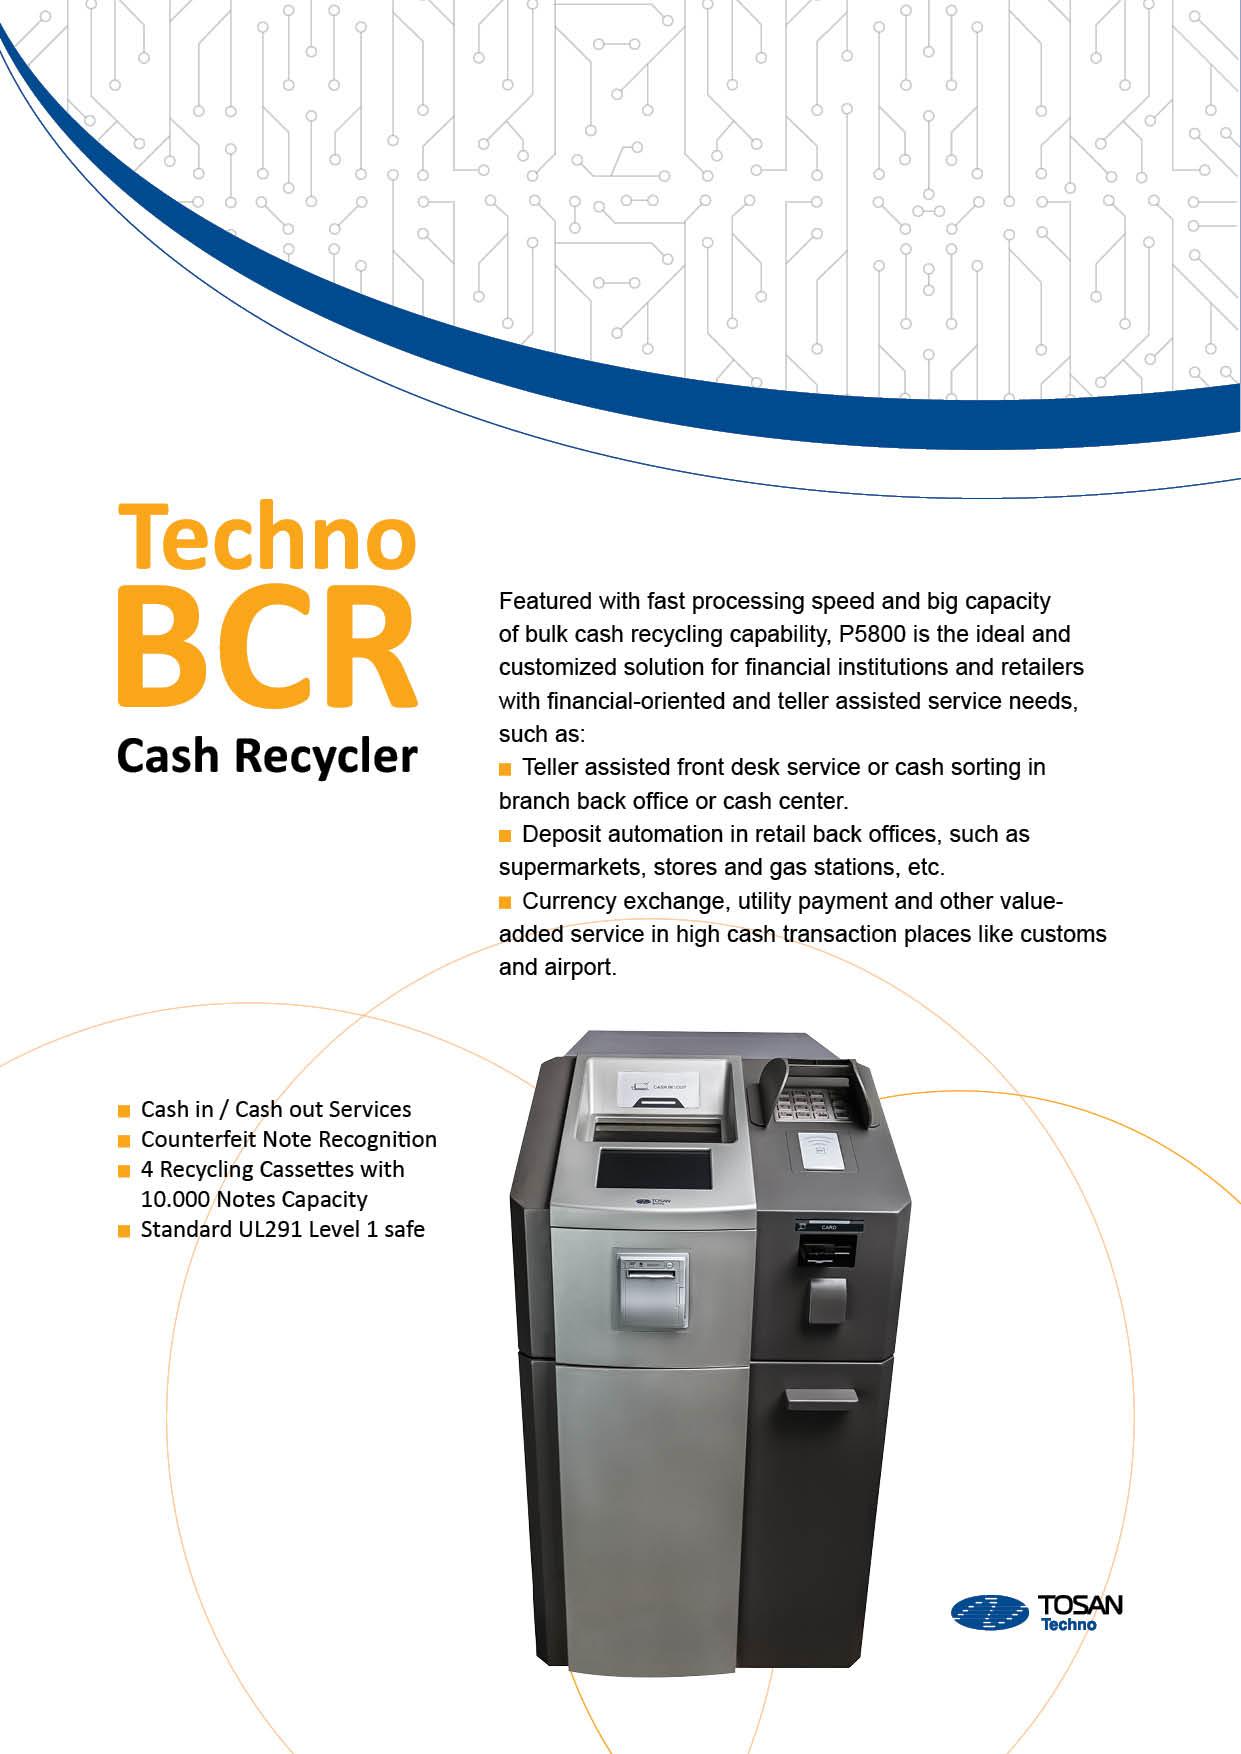 TechnoBCR